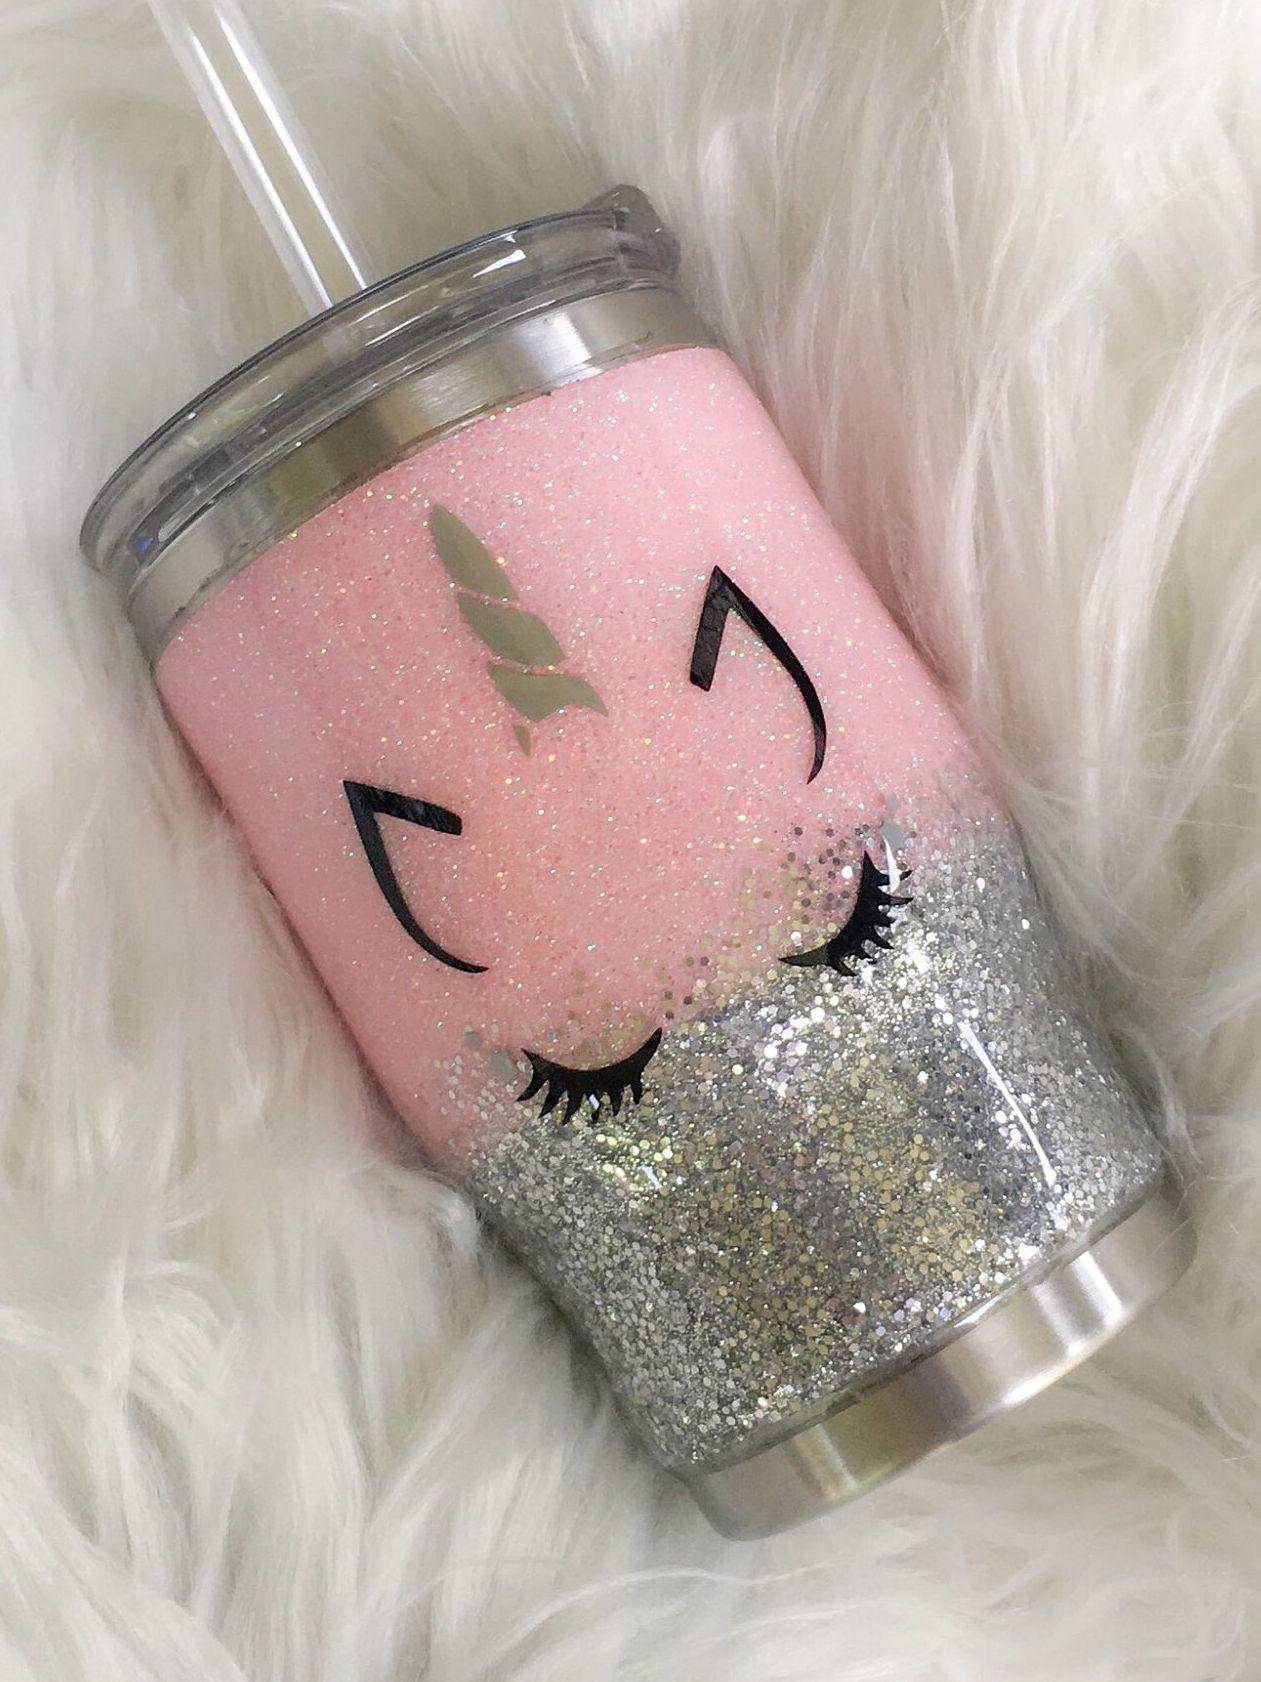 Glitter Tumbler, Unicorn Tumbler, Glitter Unicorn Tumbler, Kids Tumbler, Kids Unicorn Tumbler, Kids Glitter Unicorn Tumbler #cutecups